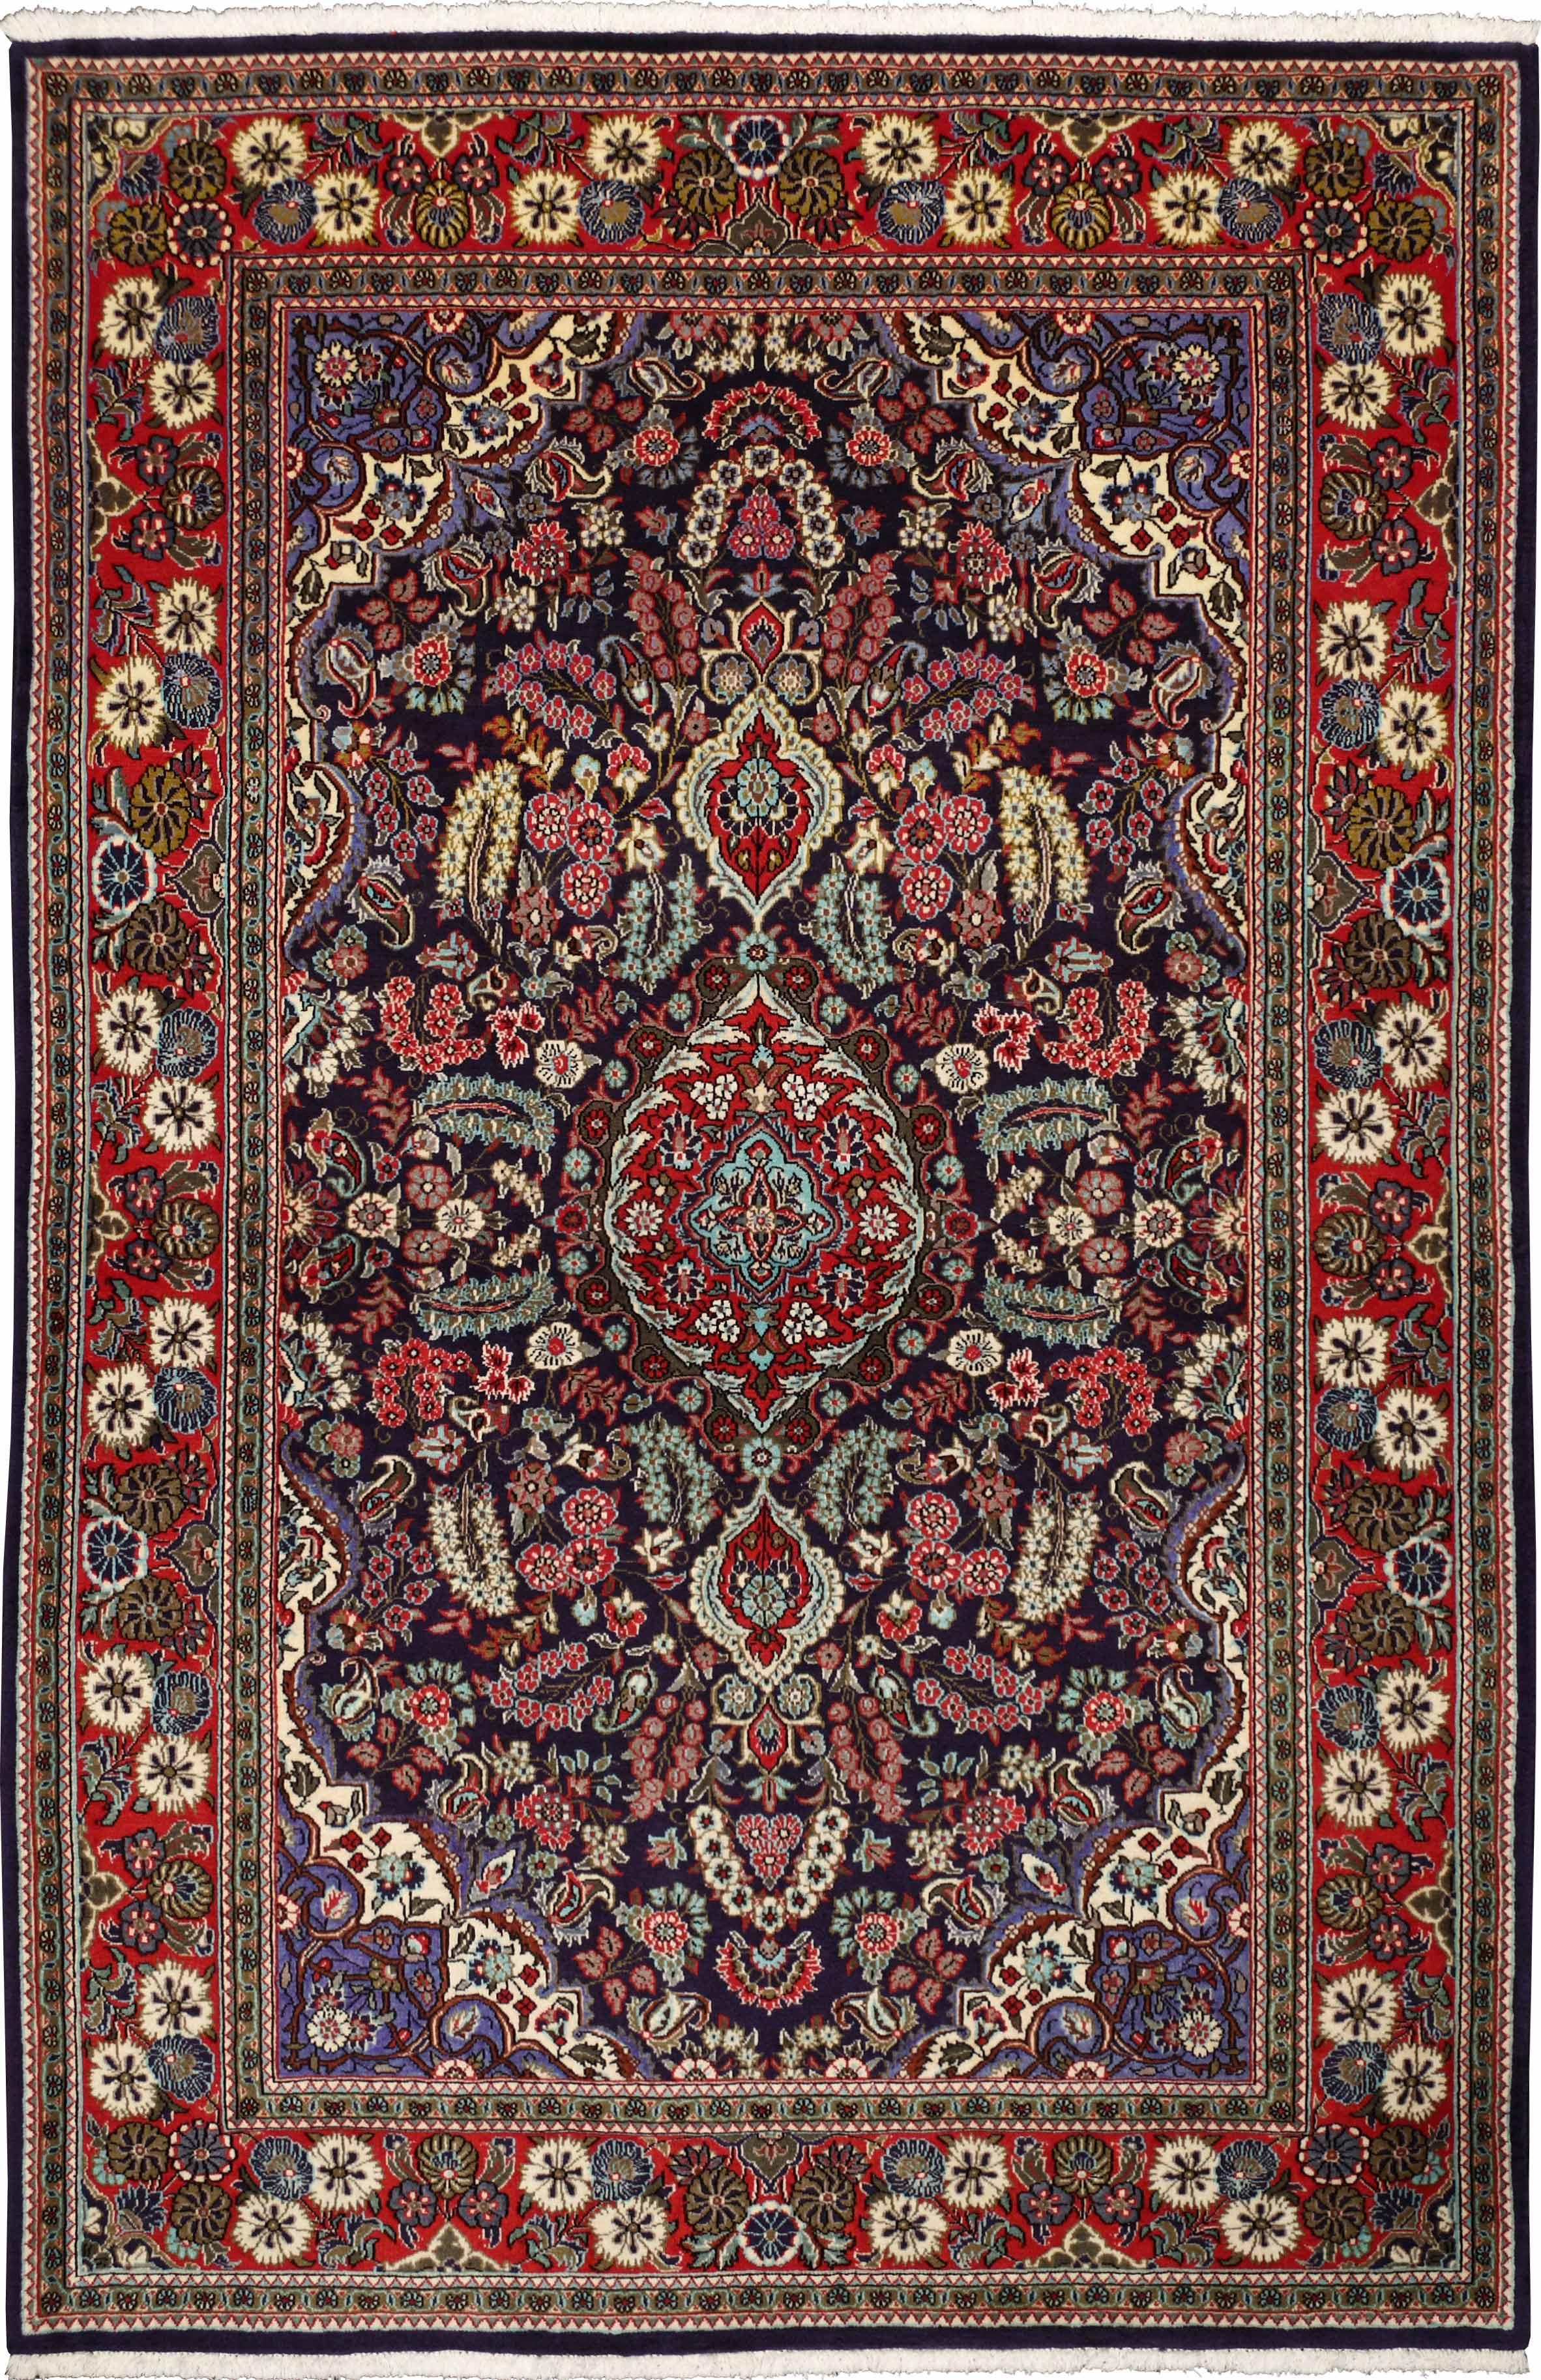 950159 ghom 207x136cm iranian carpet. Black Bedroom Furniture Sets. Home Design Ideas